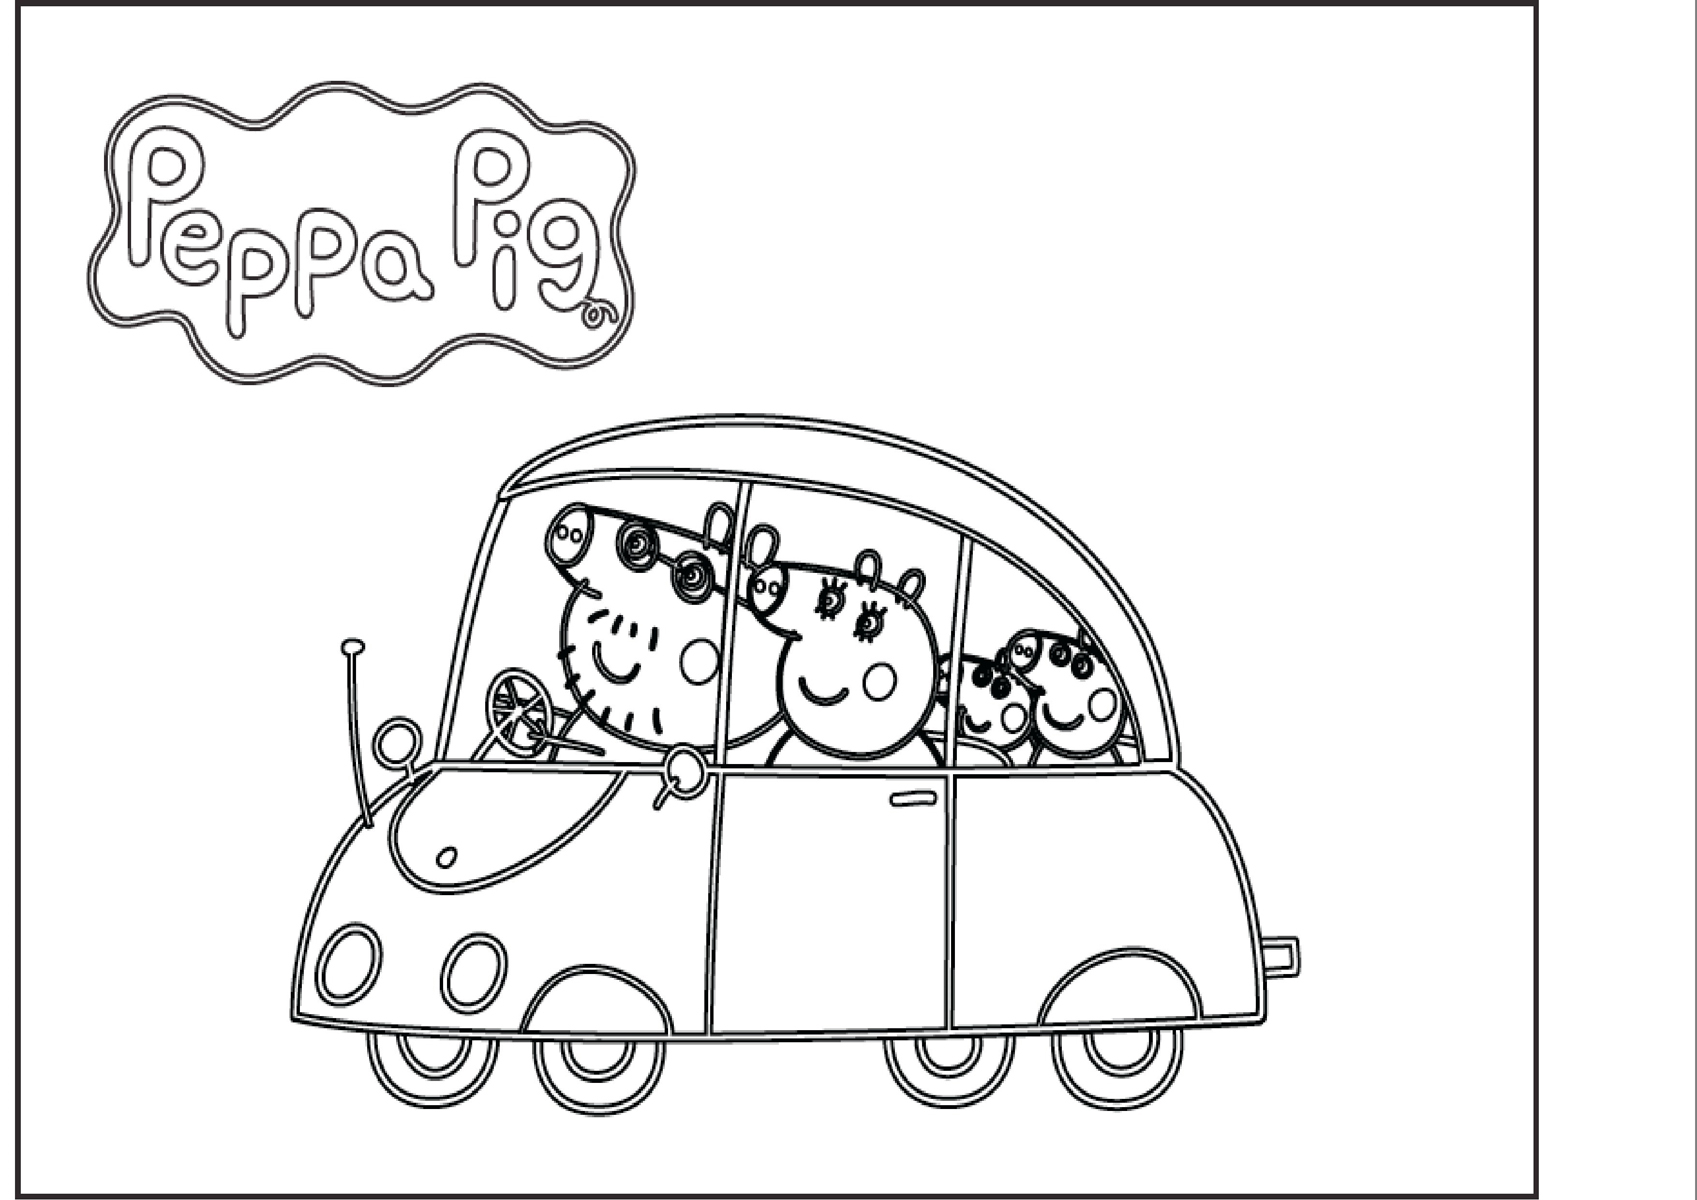 Свинка пеппа на машине раскраска